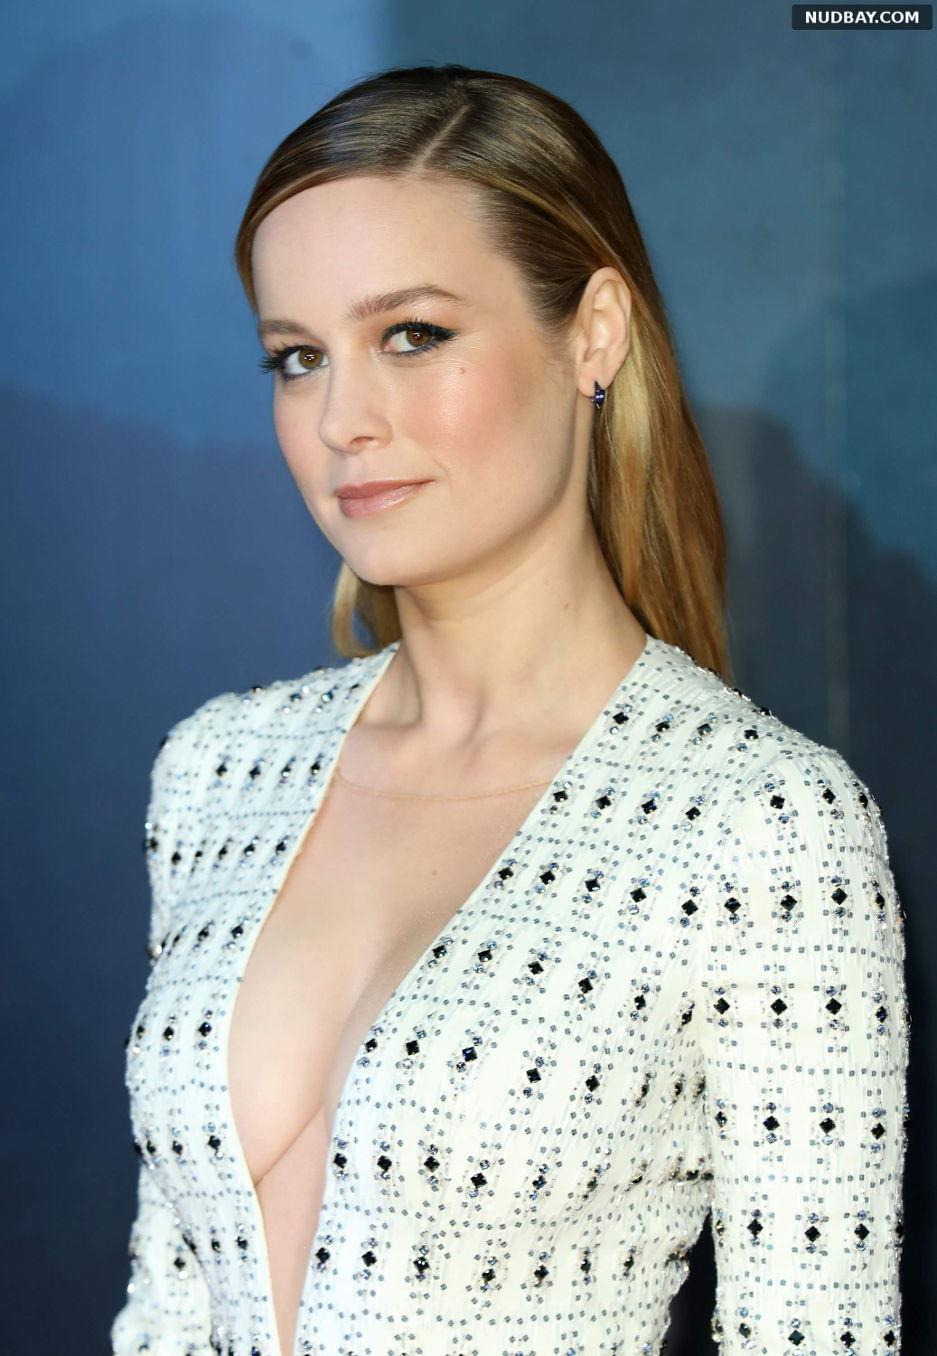 Brie Larson Nude at Kong: Skull Island premiere in London Feb 28 2017